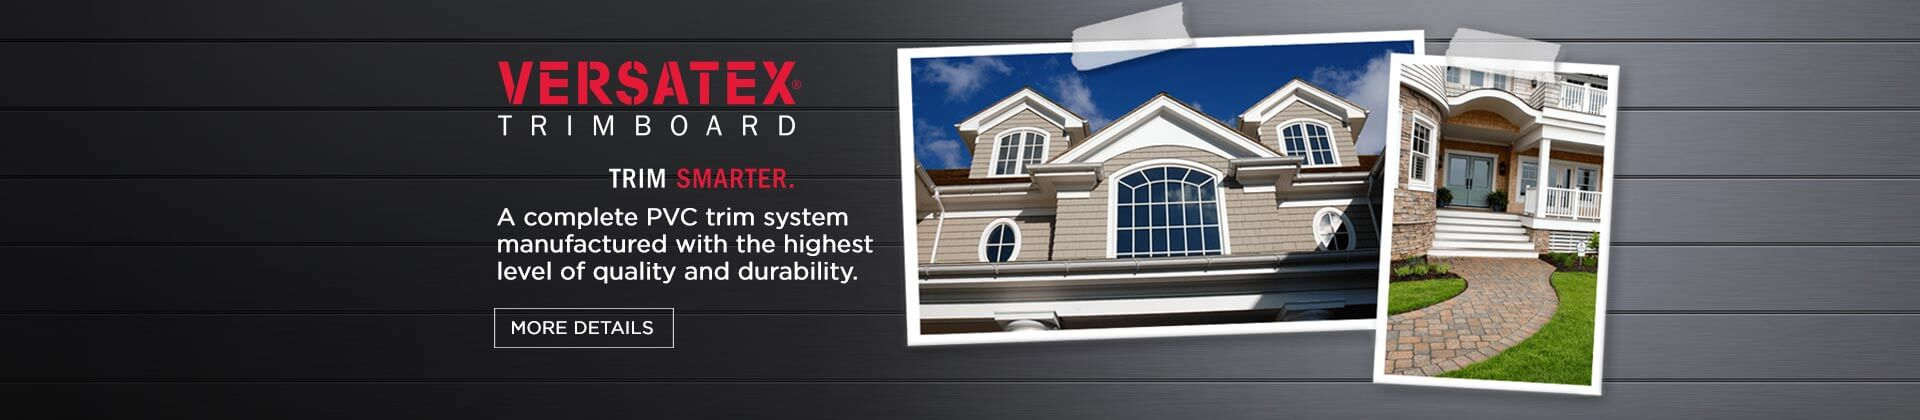 Warren Trask, Warren Trask Company, Premium Building Materials, Building Materials, Versatex, PVC